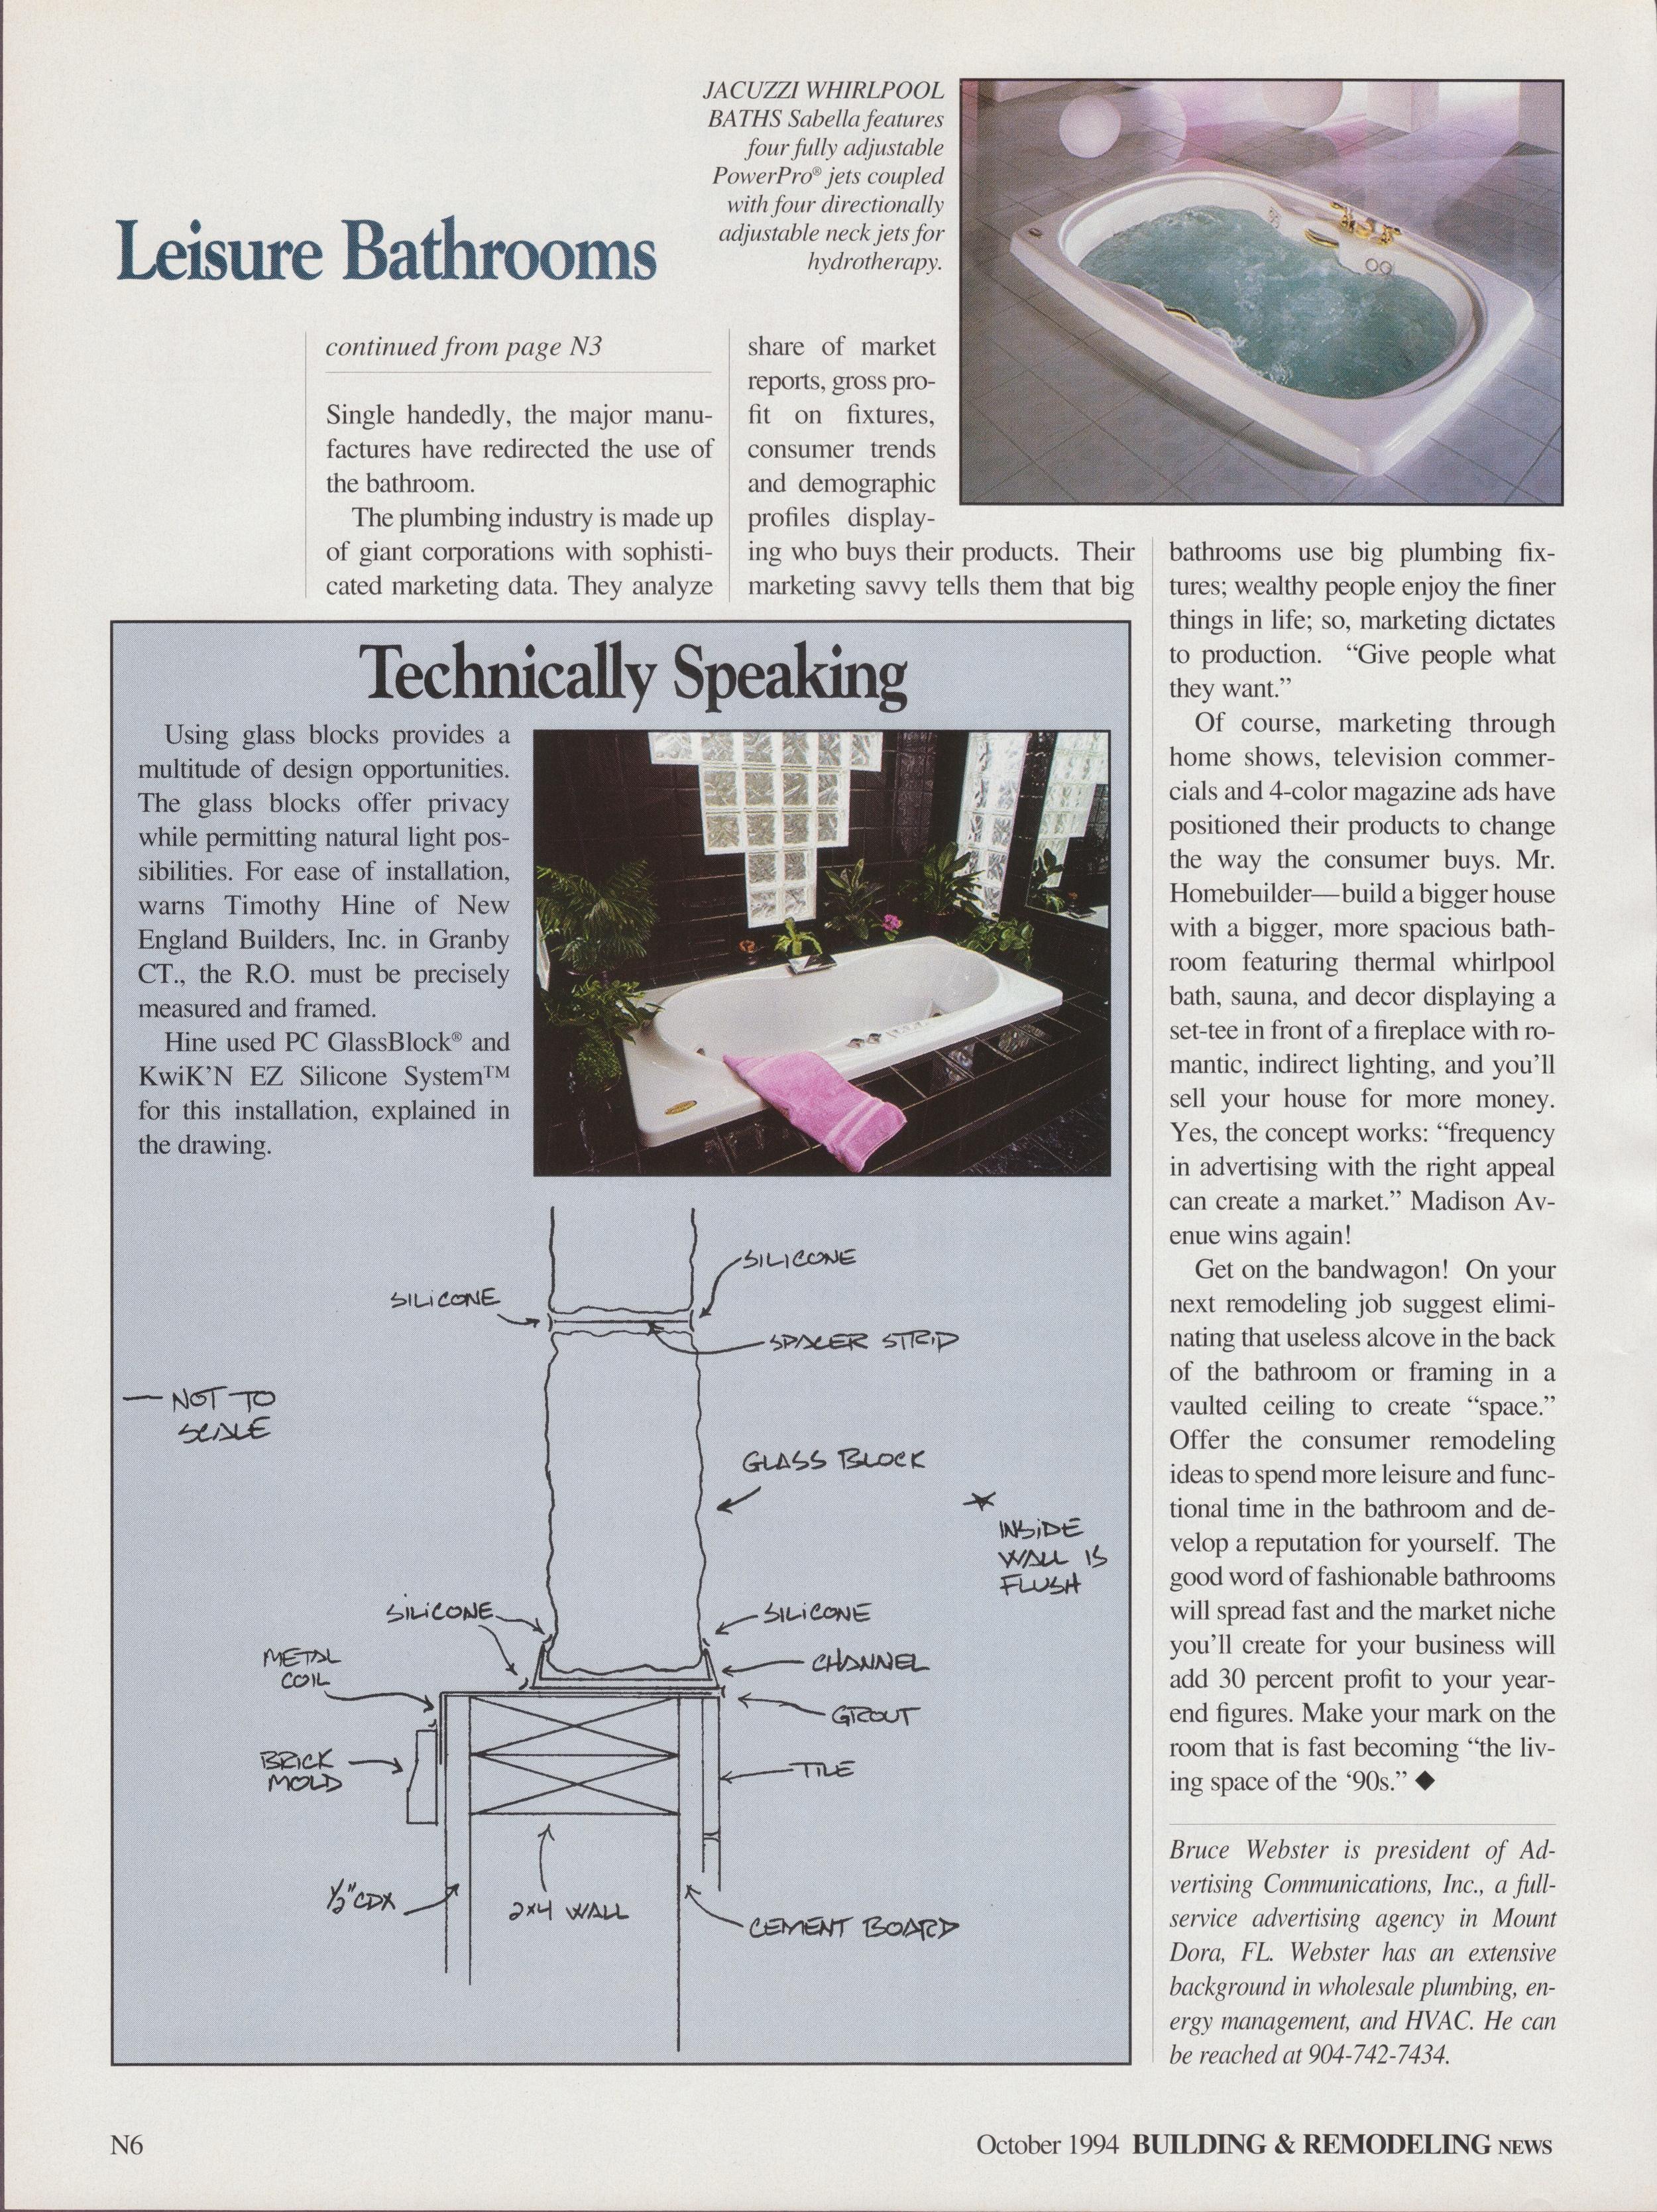 Remodeling_News_bath1994d.jpg